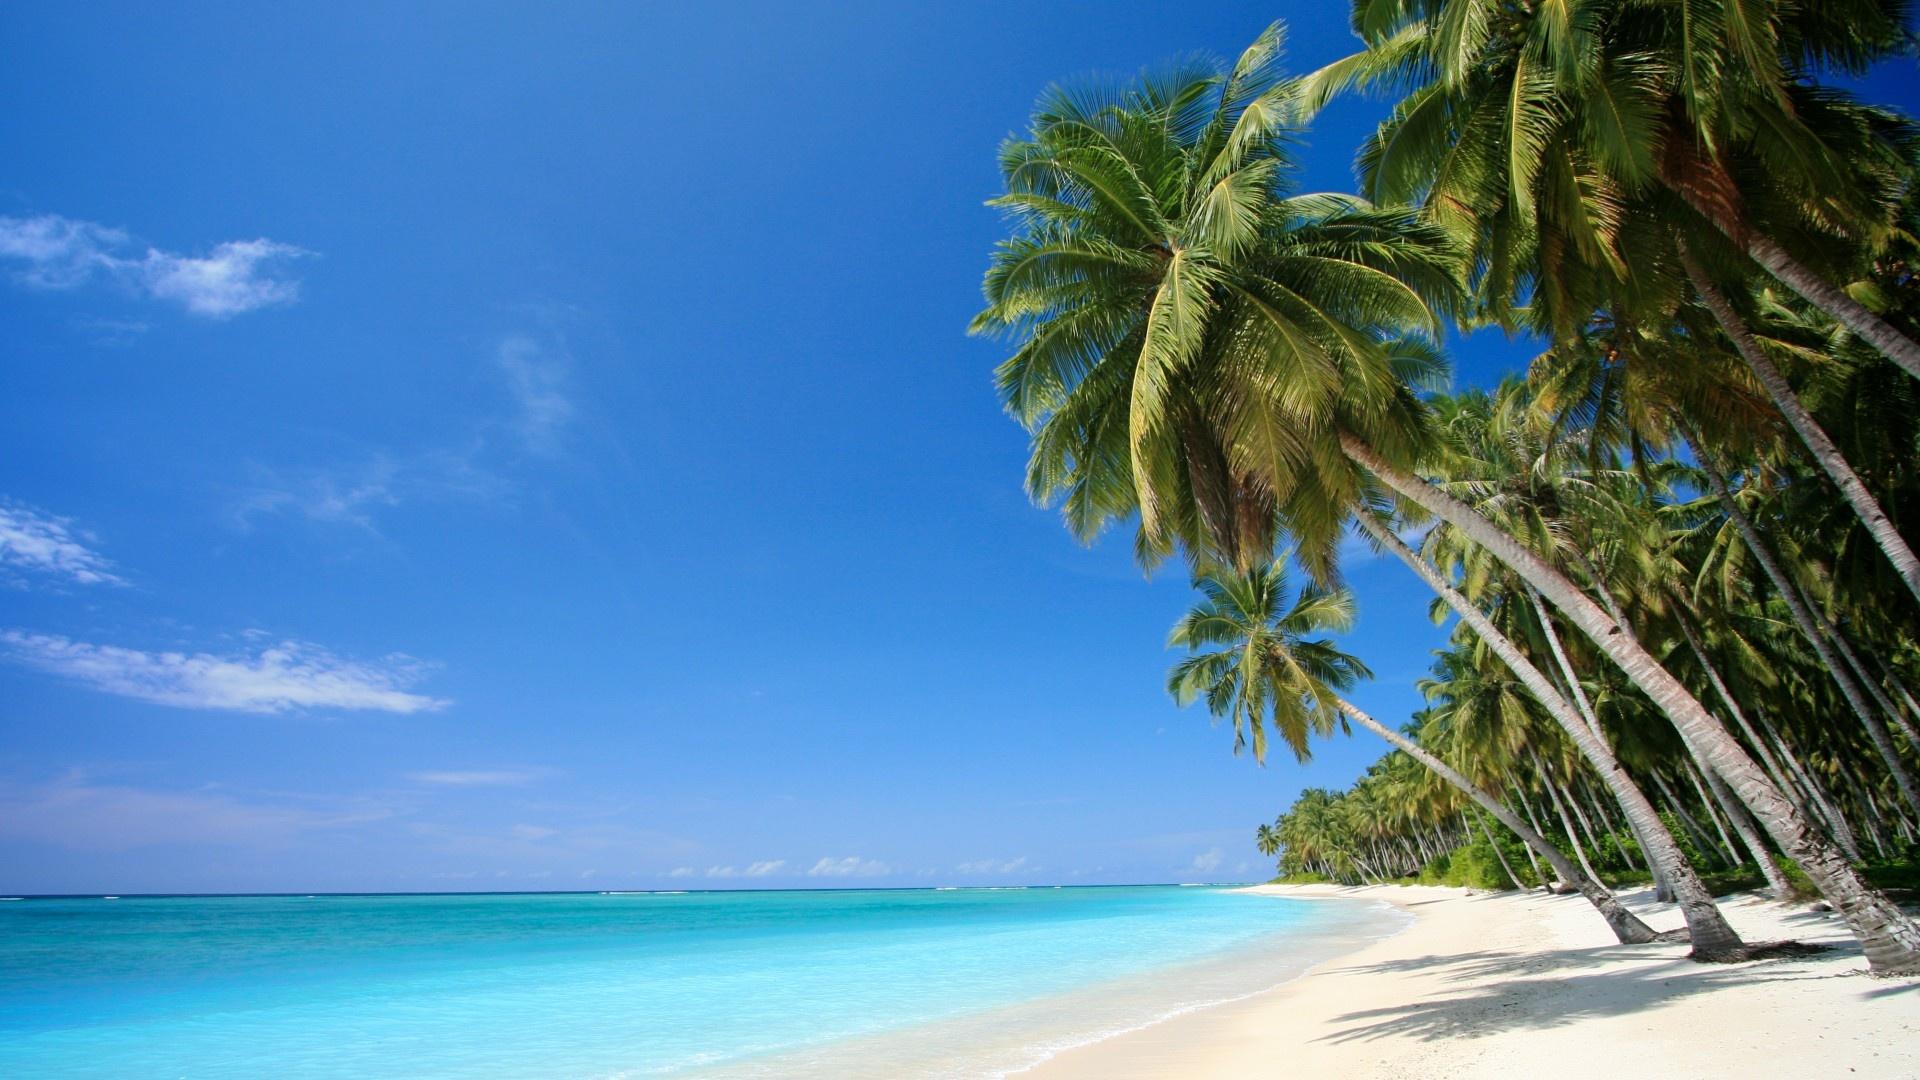 Wallpaper caribbean sea palm beach sea caribbean desktop wallpaper 1920x1080